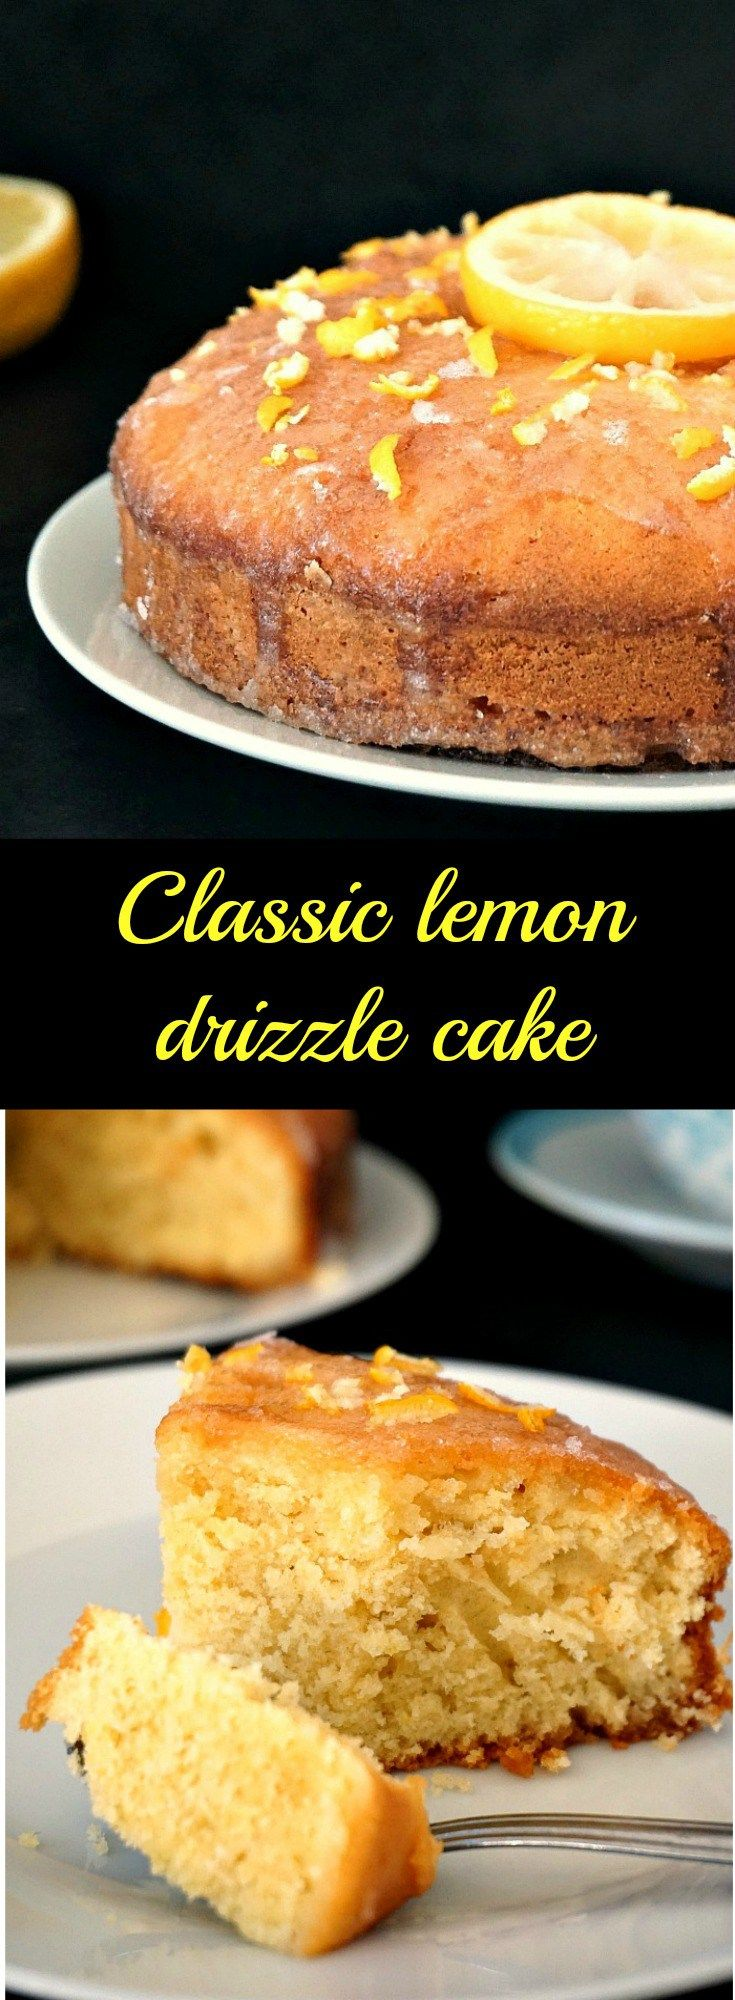 Classic lemon drizzle cake recipe